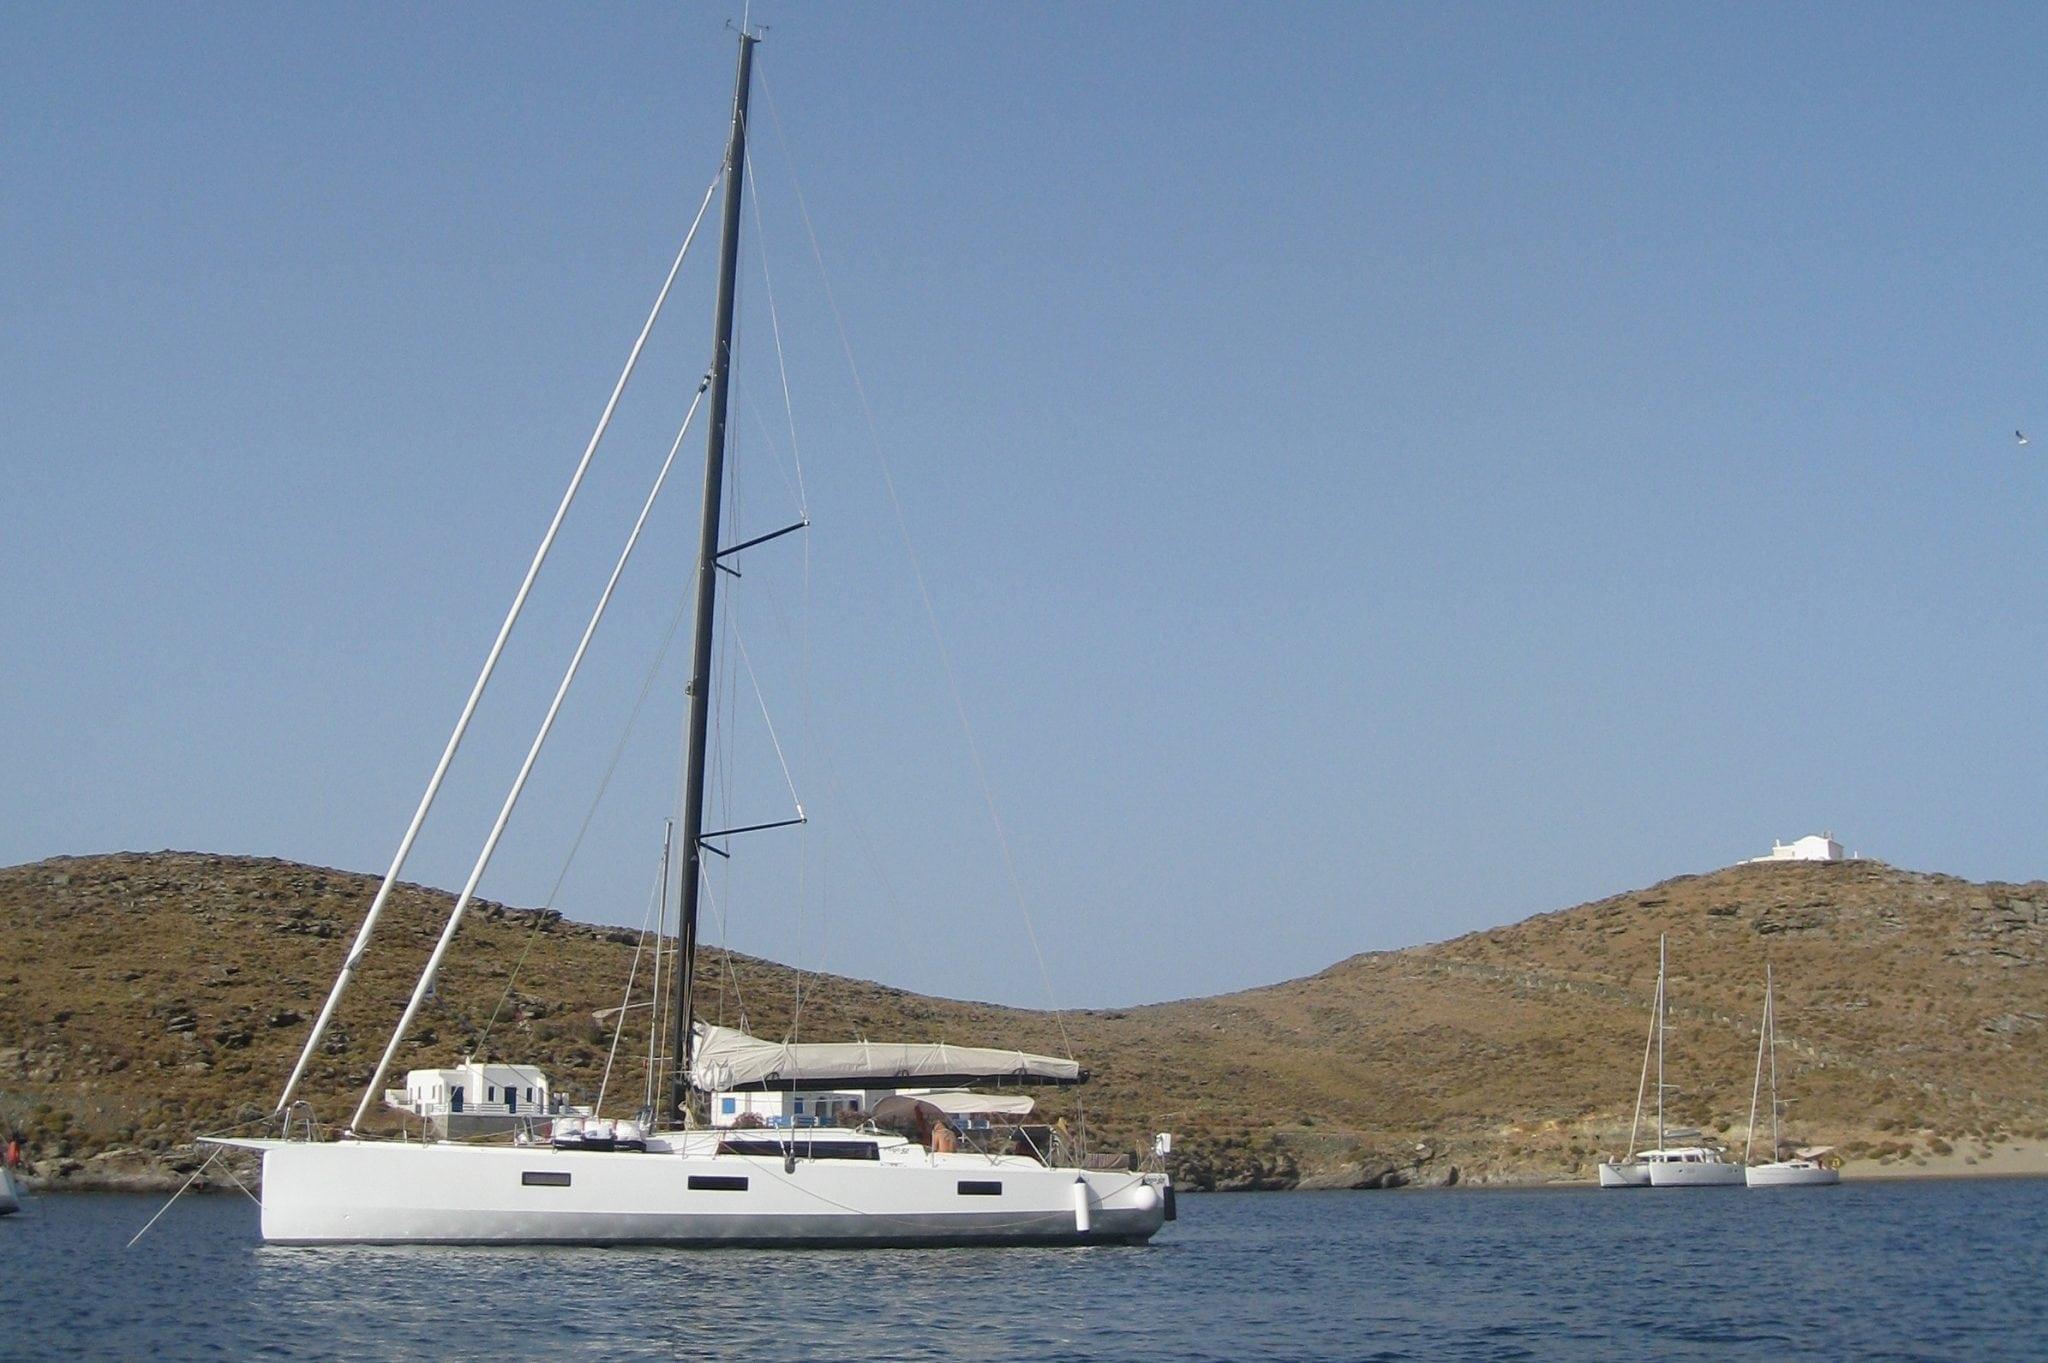 Pogo50 - In Kythnos Greece